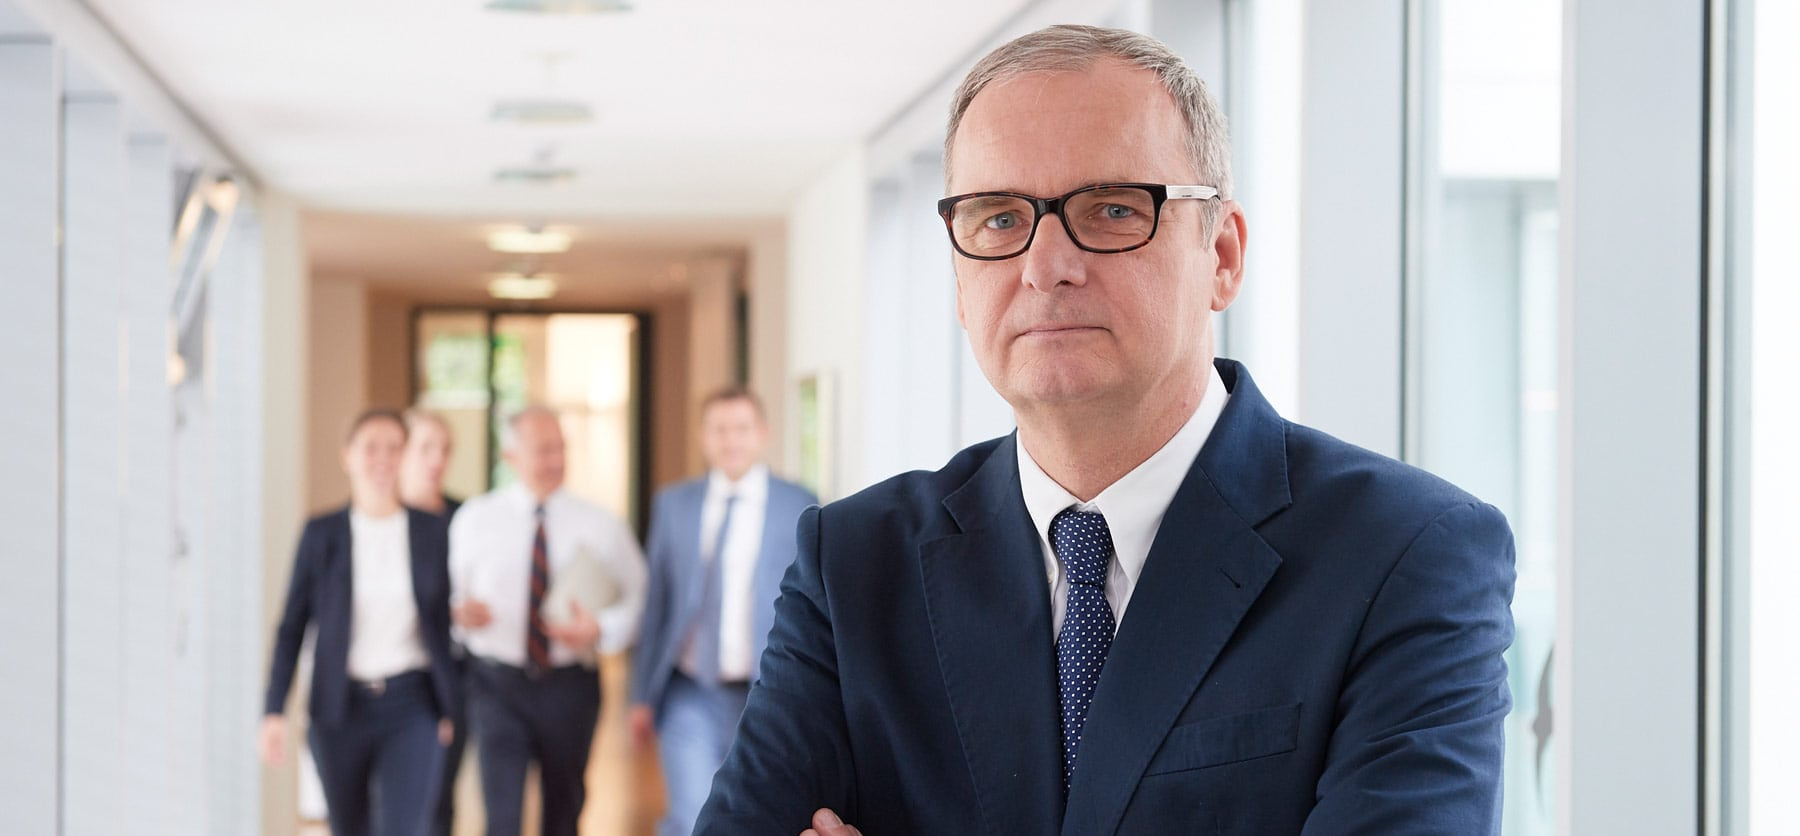 Portraitfoto Anwalt in Kanzlei